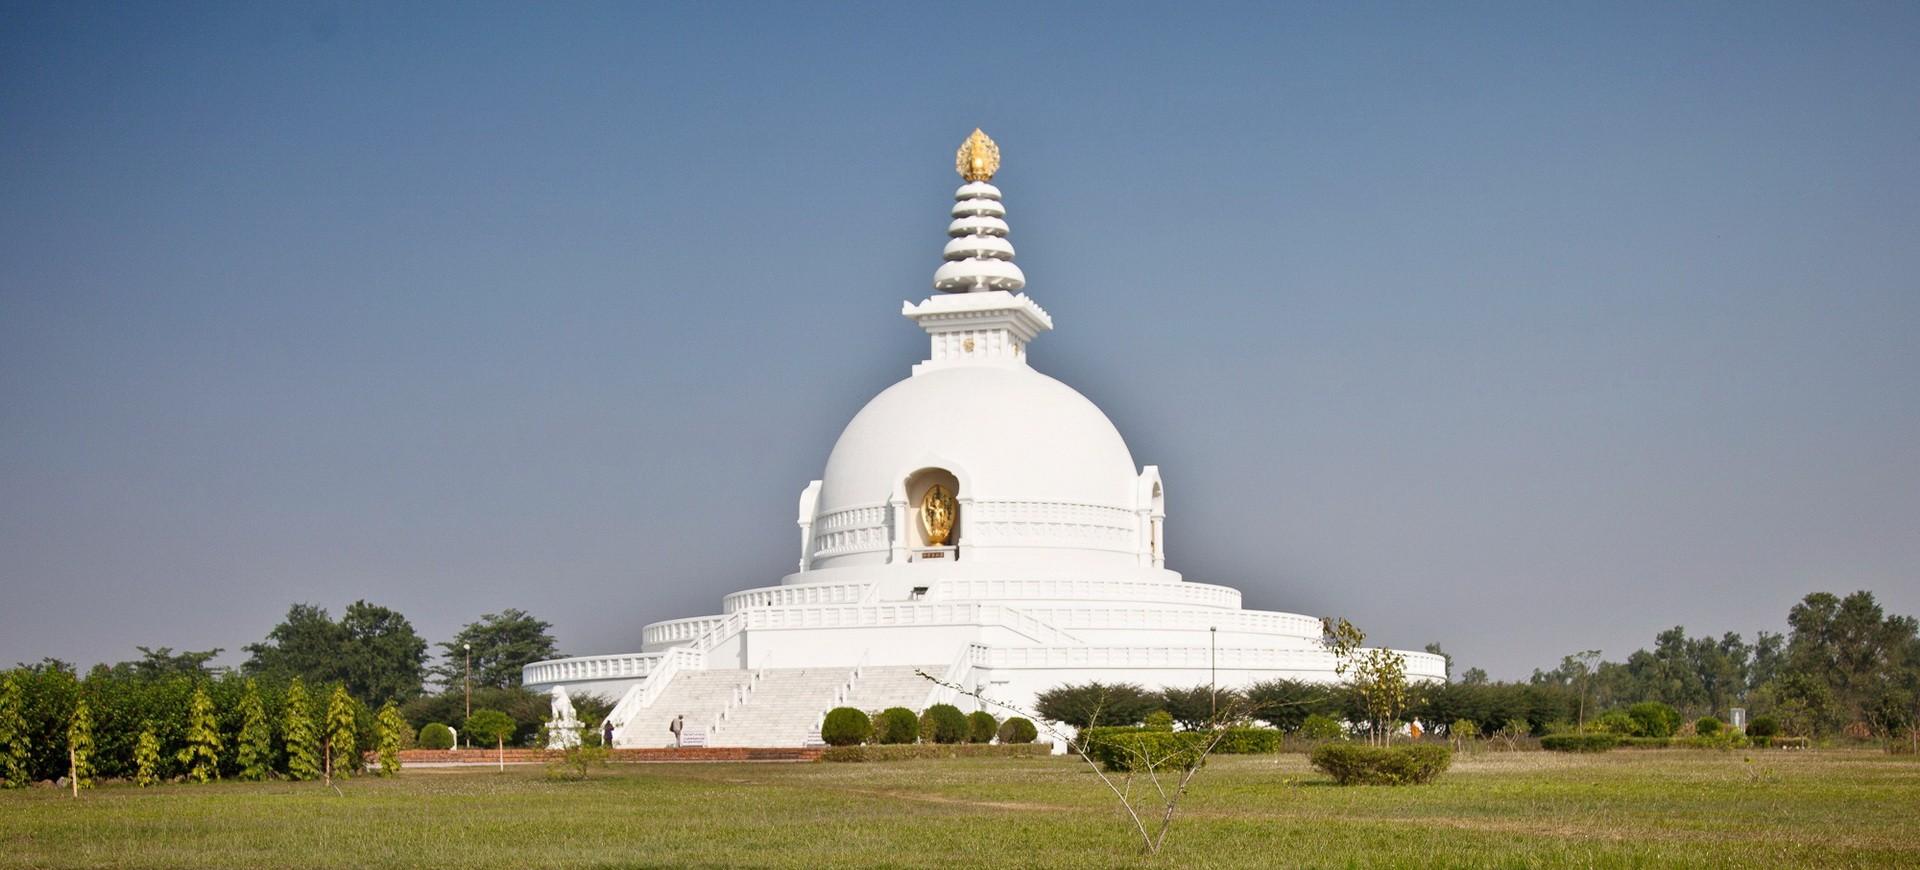 Népal Lumbini Stupa